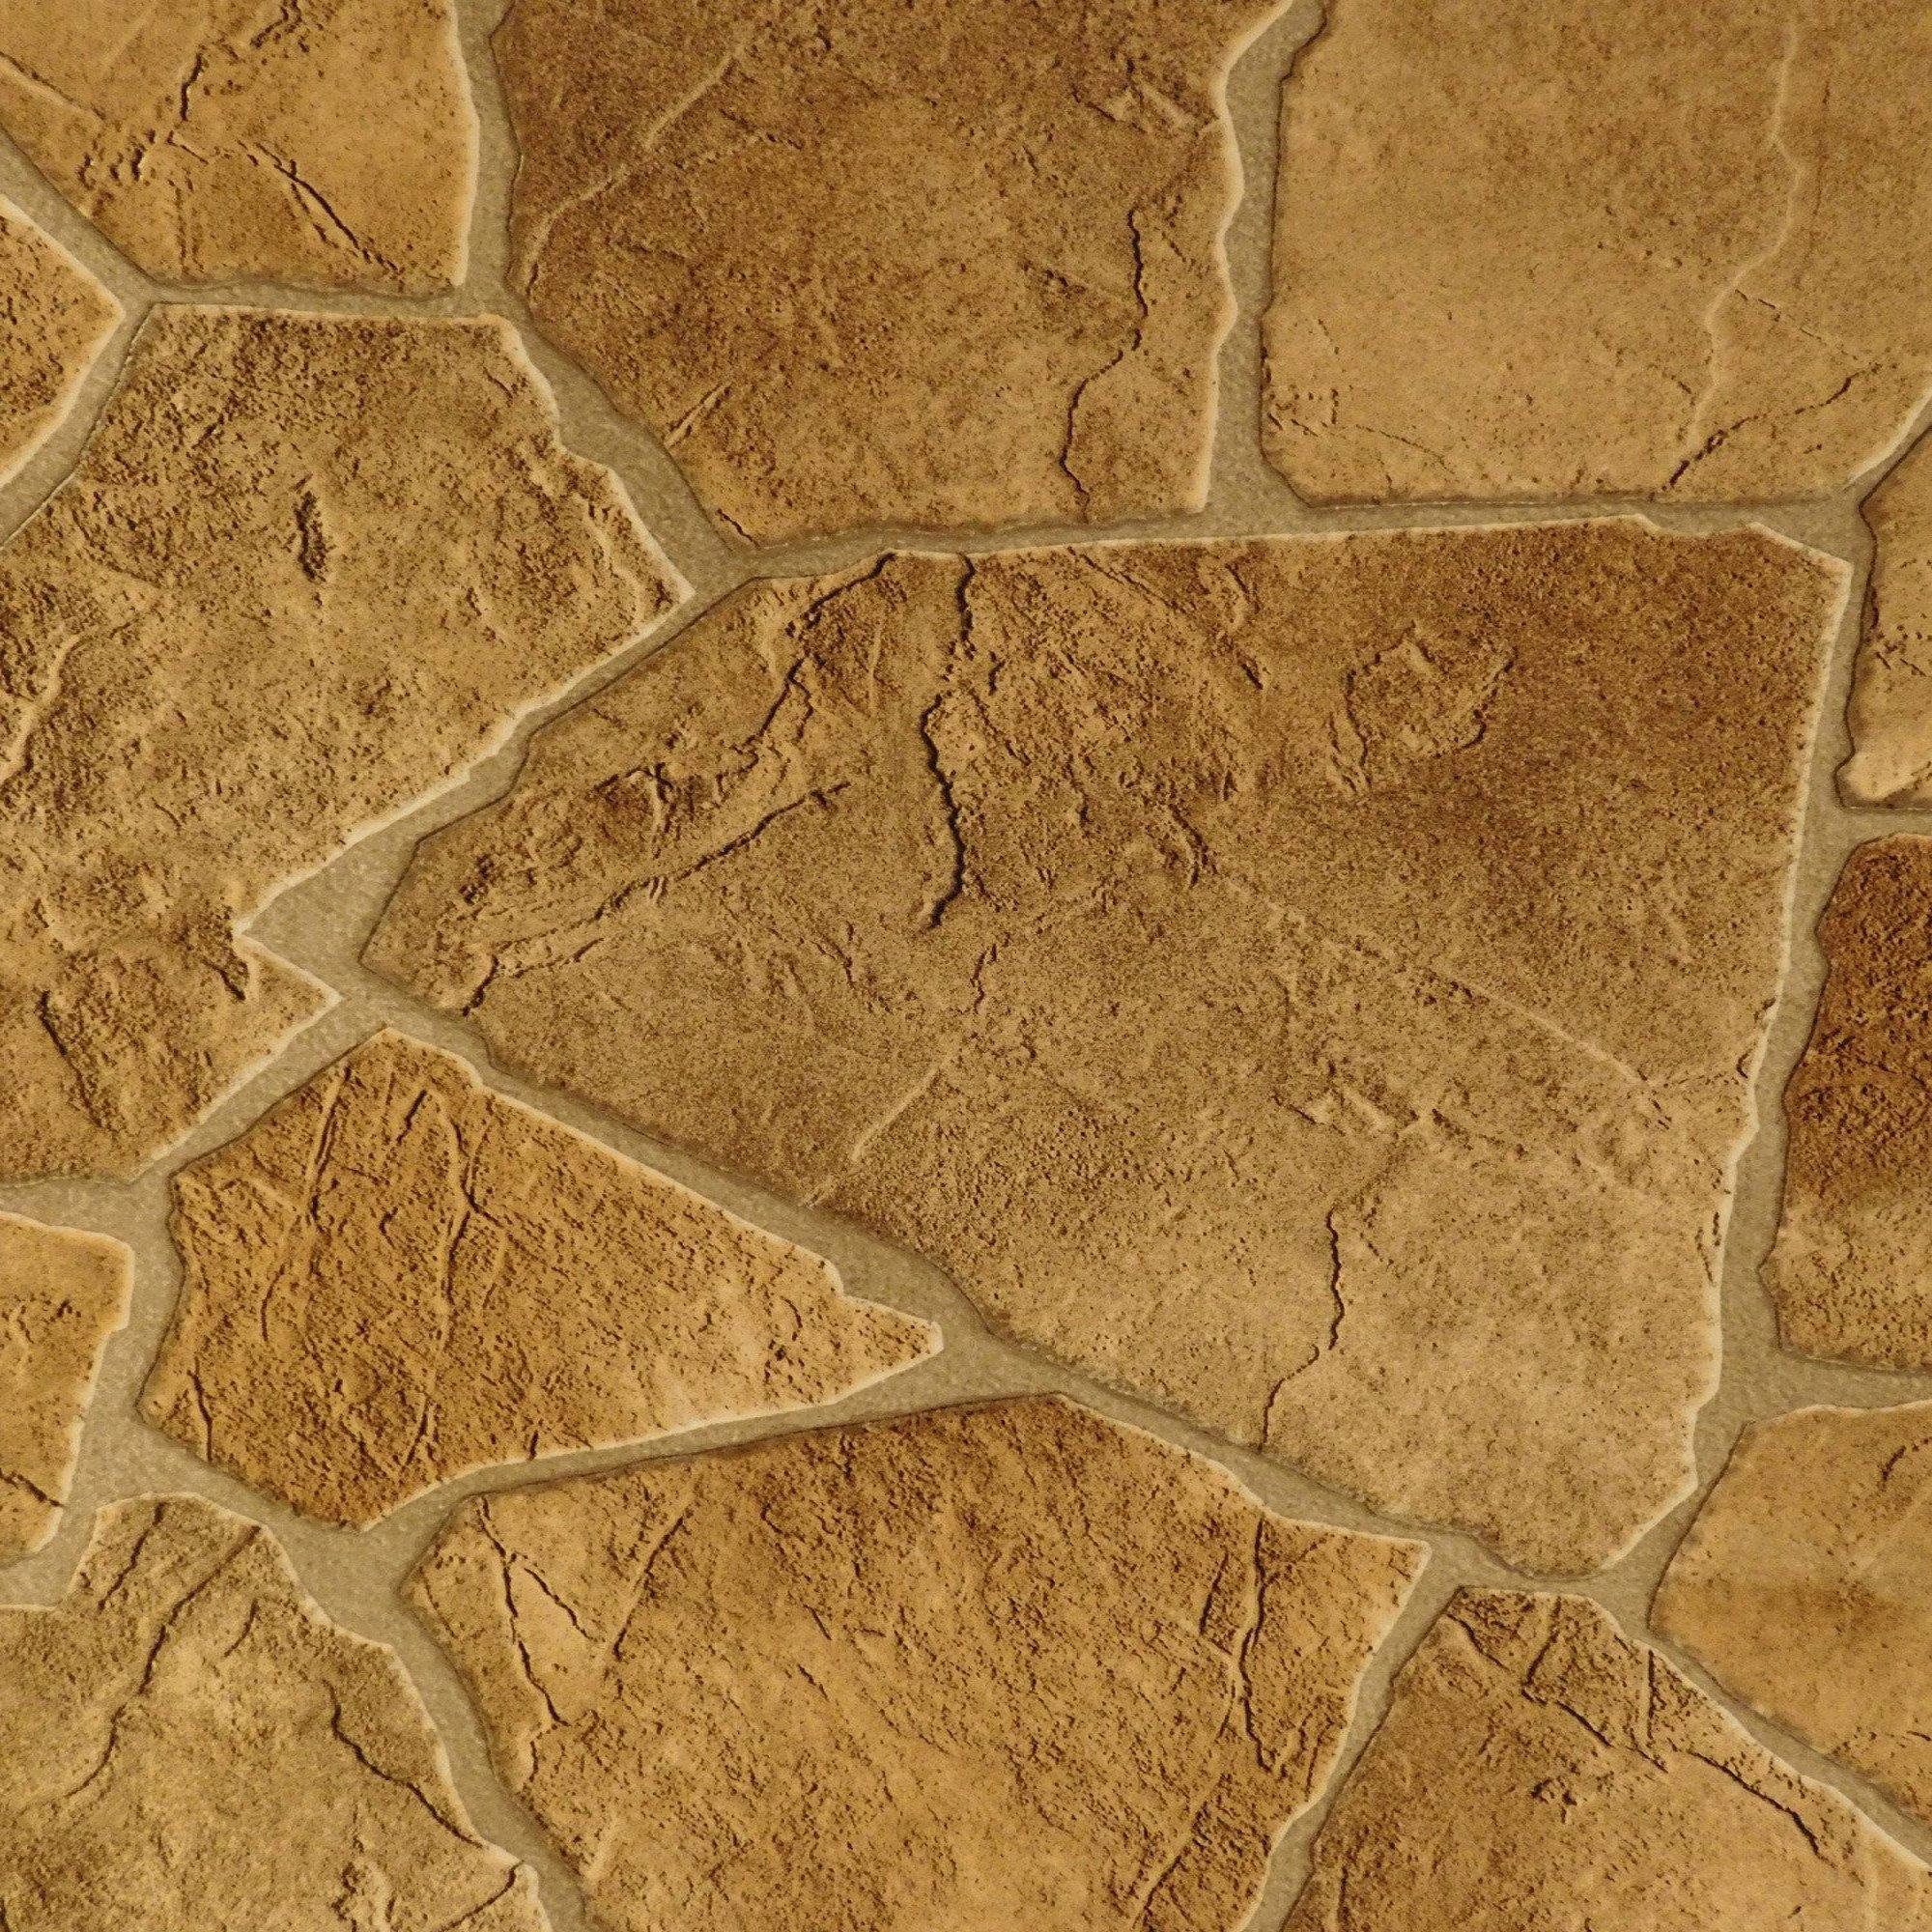 WYKŁADZINA PCV LINOLEUM GUMOLIT kamień 3m 4m wzory